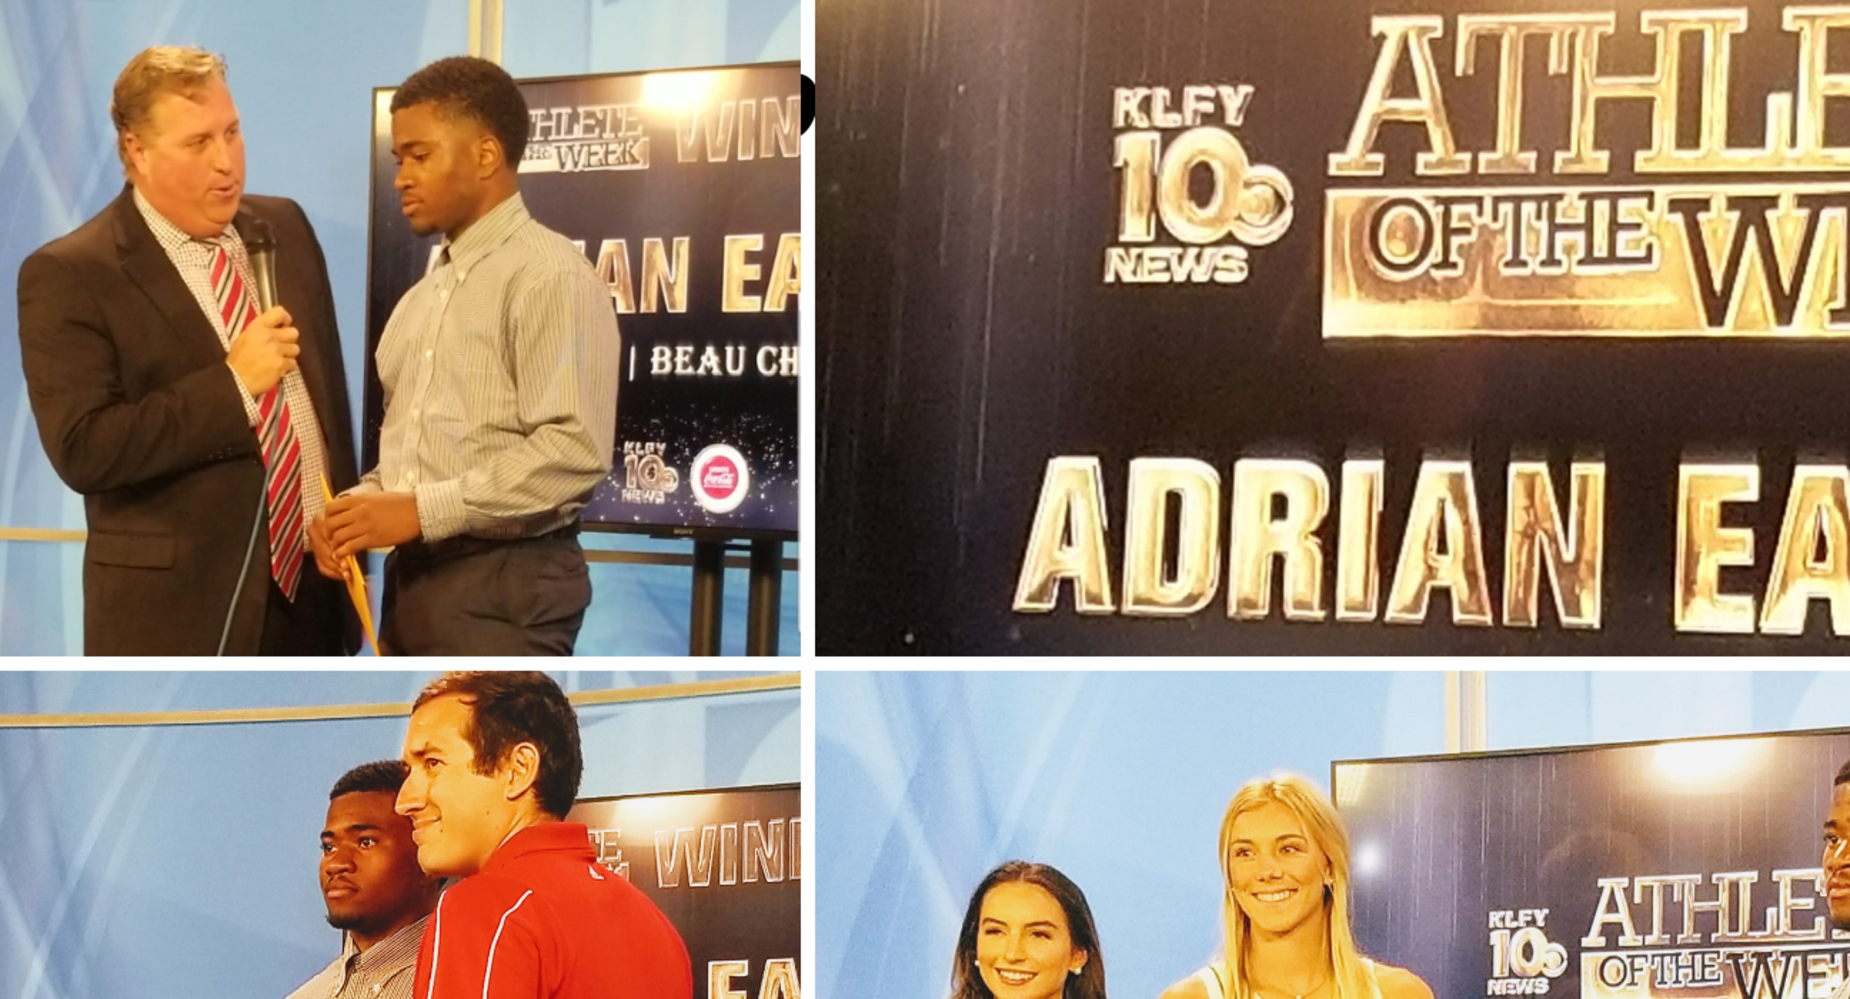 Adrian Eaglin, Best Athlete of the Week